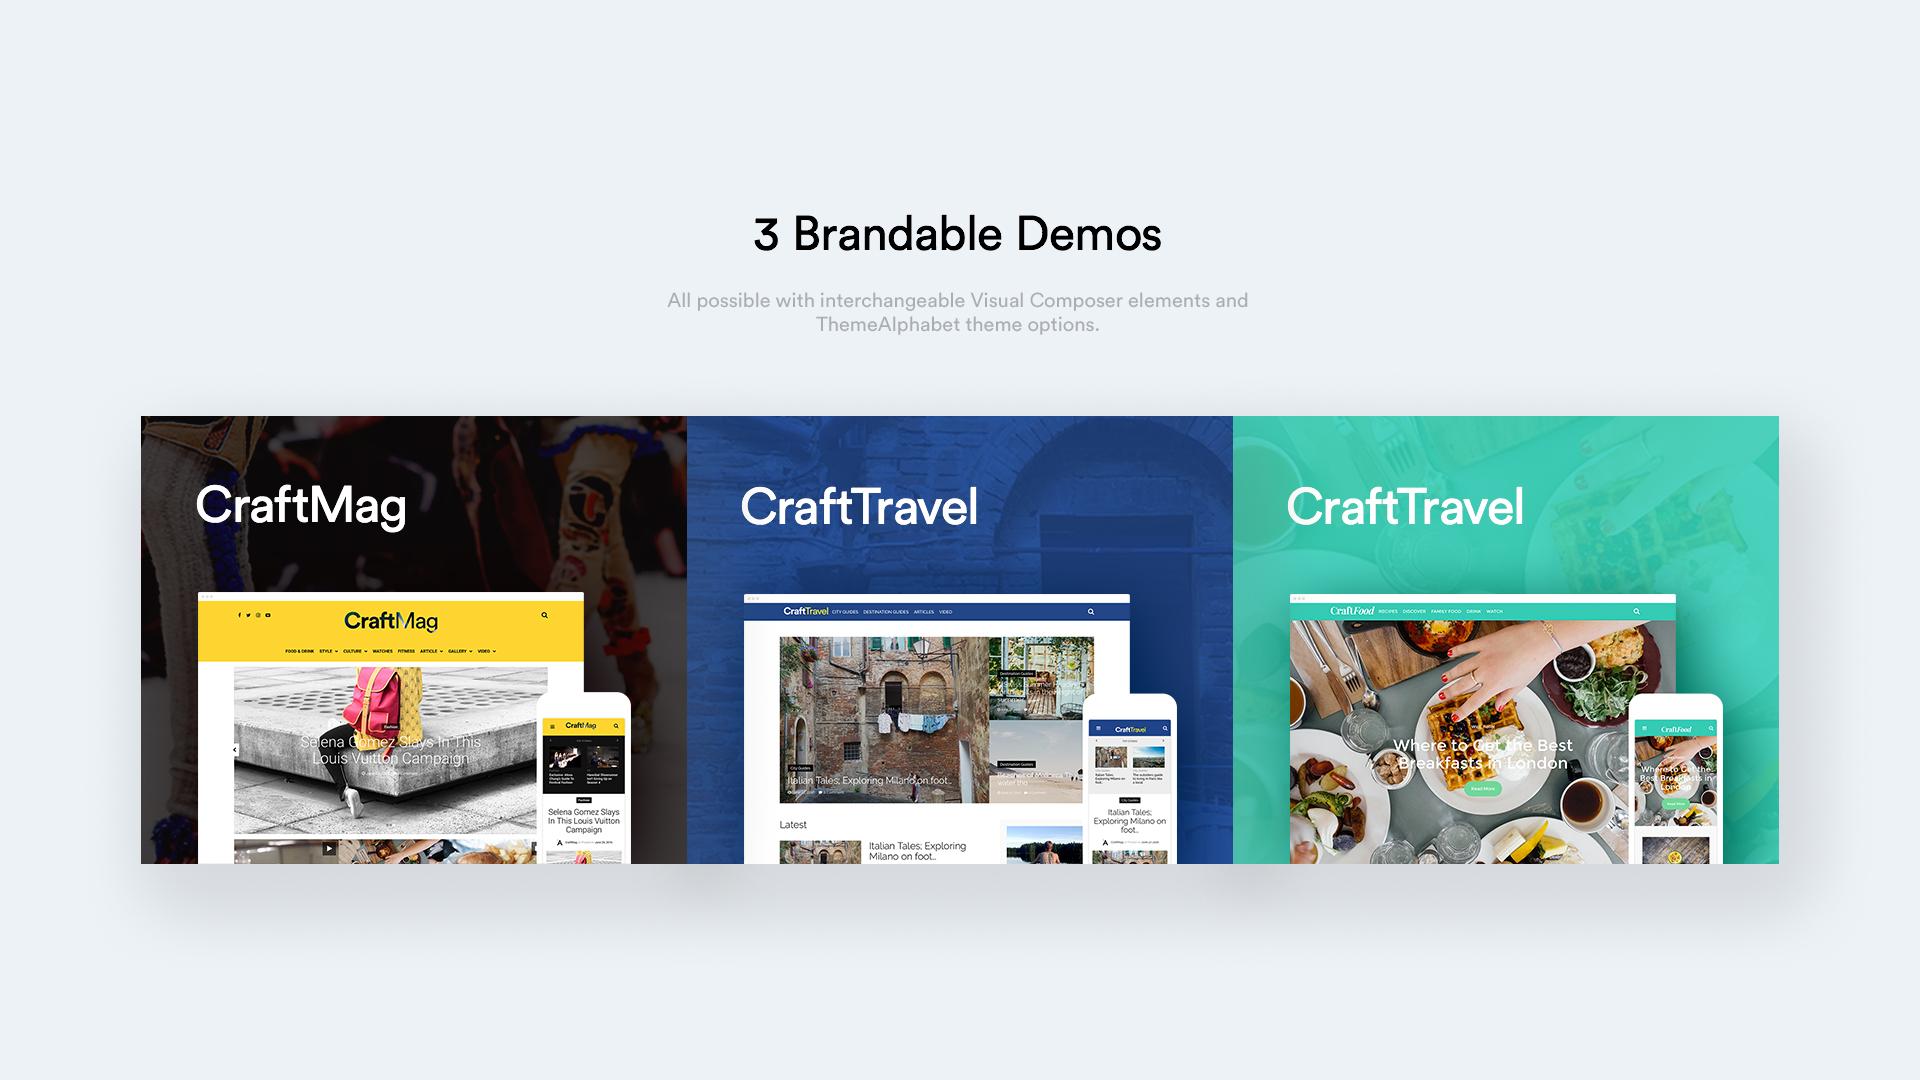 3 brandable demos